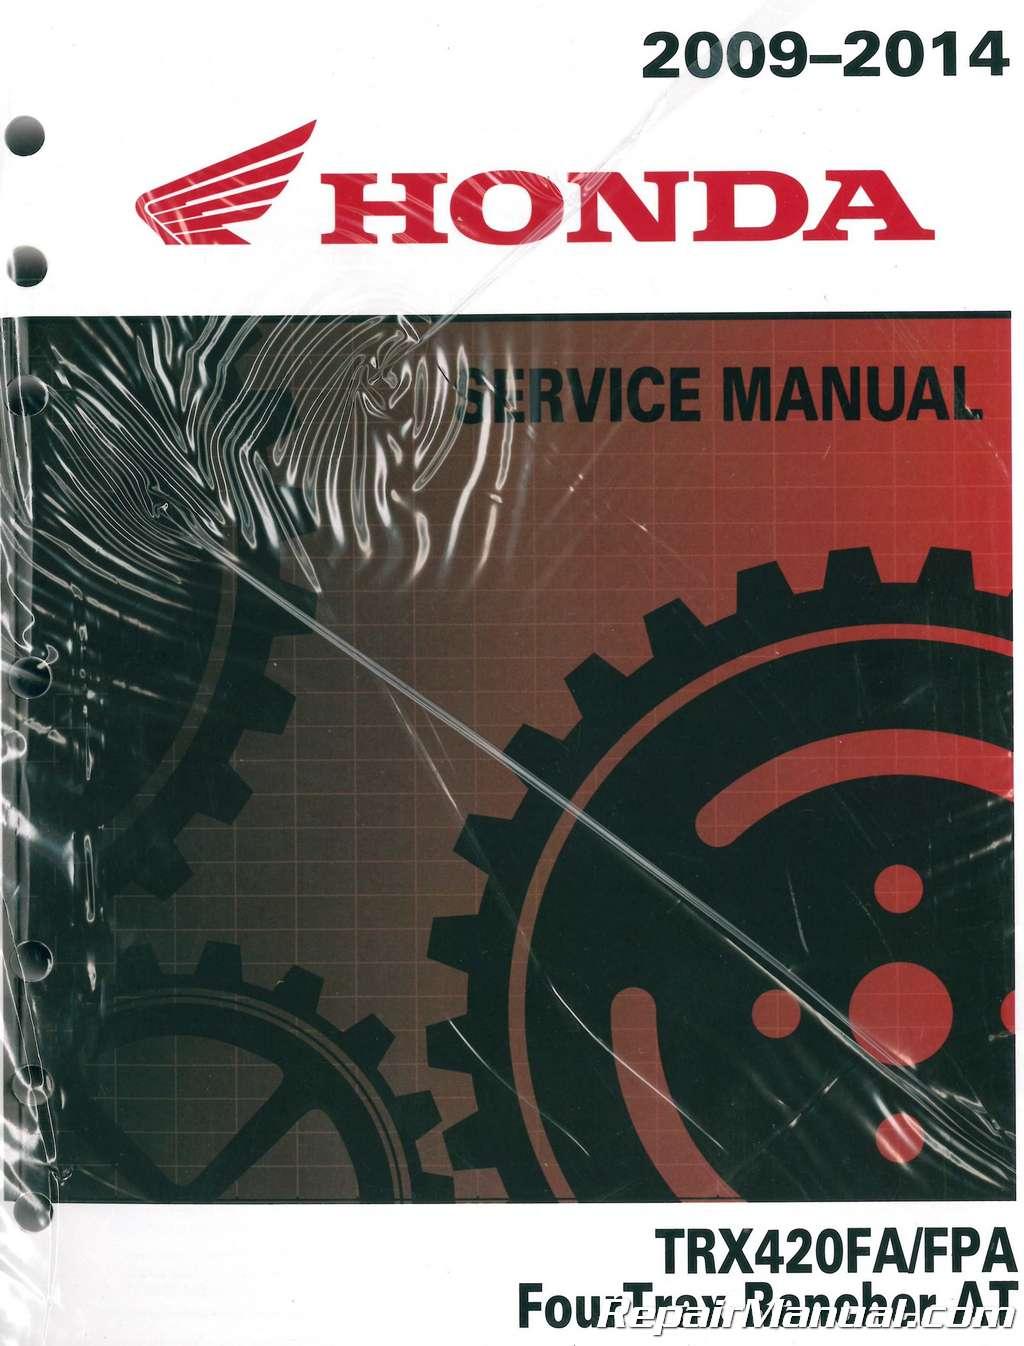 Honda F+R Brake Pads TRX 420 FA FPA Fourtrax Rancher AT 2009 2010 2011 2012 ATV